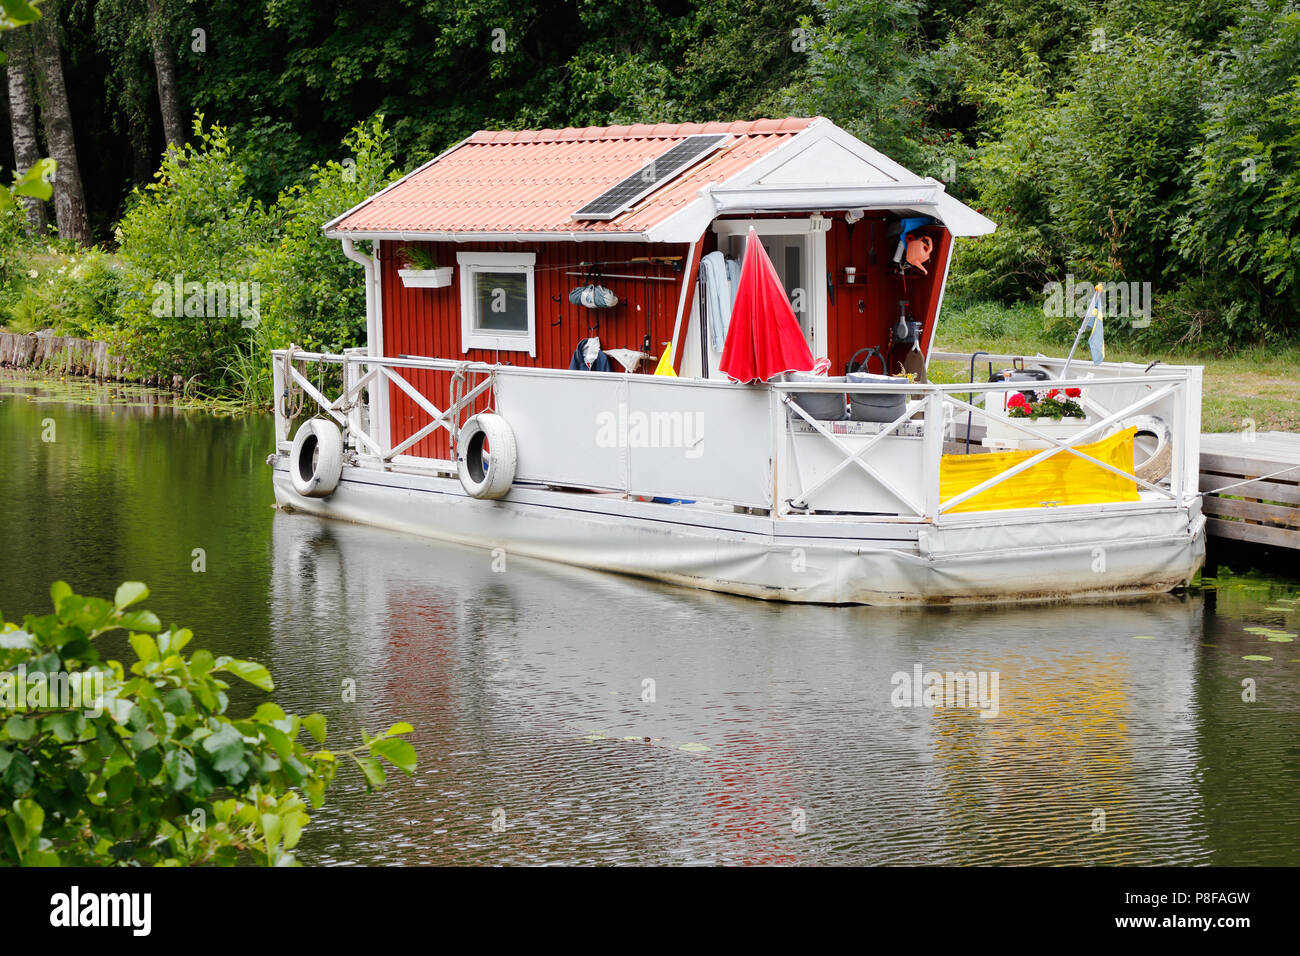 Stupendous Hjalmare Docka Sweden July 9 2018 Small Red Houseboat Download Free Architecture Designs Scobabritishbridgeorg